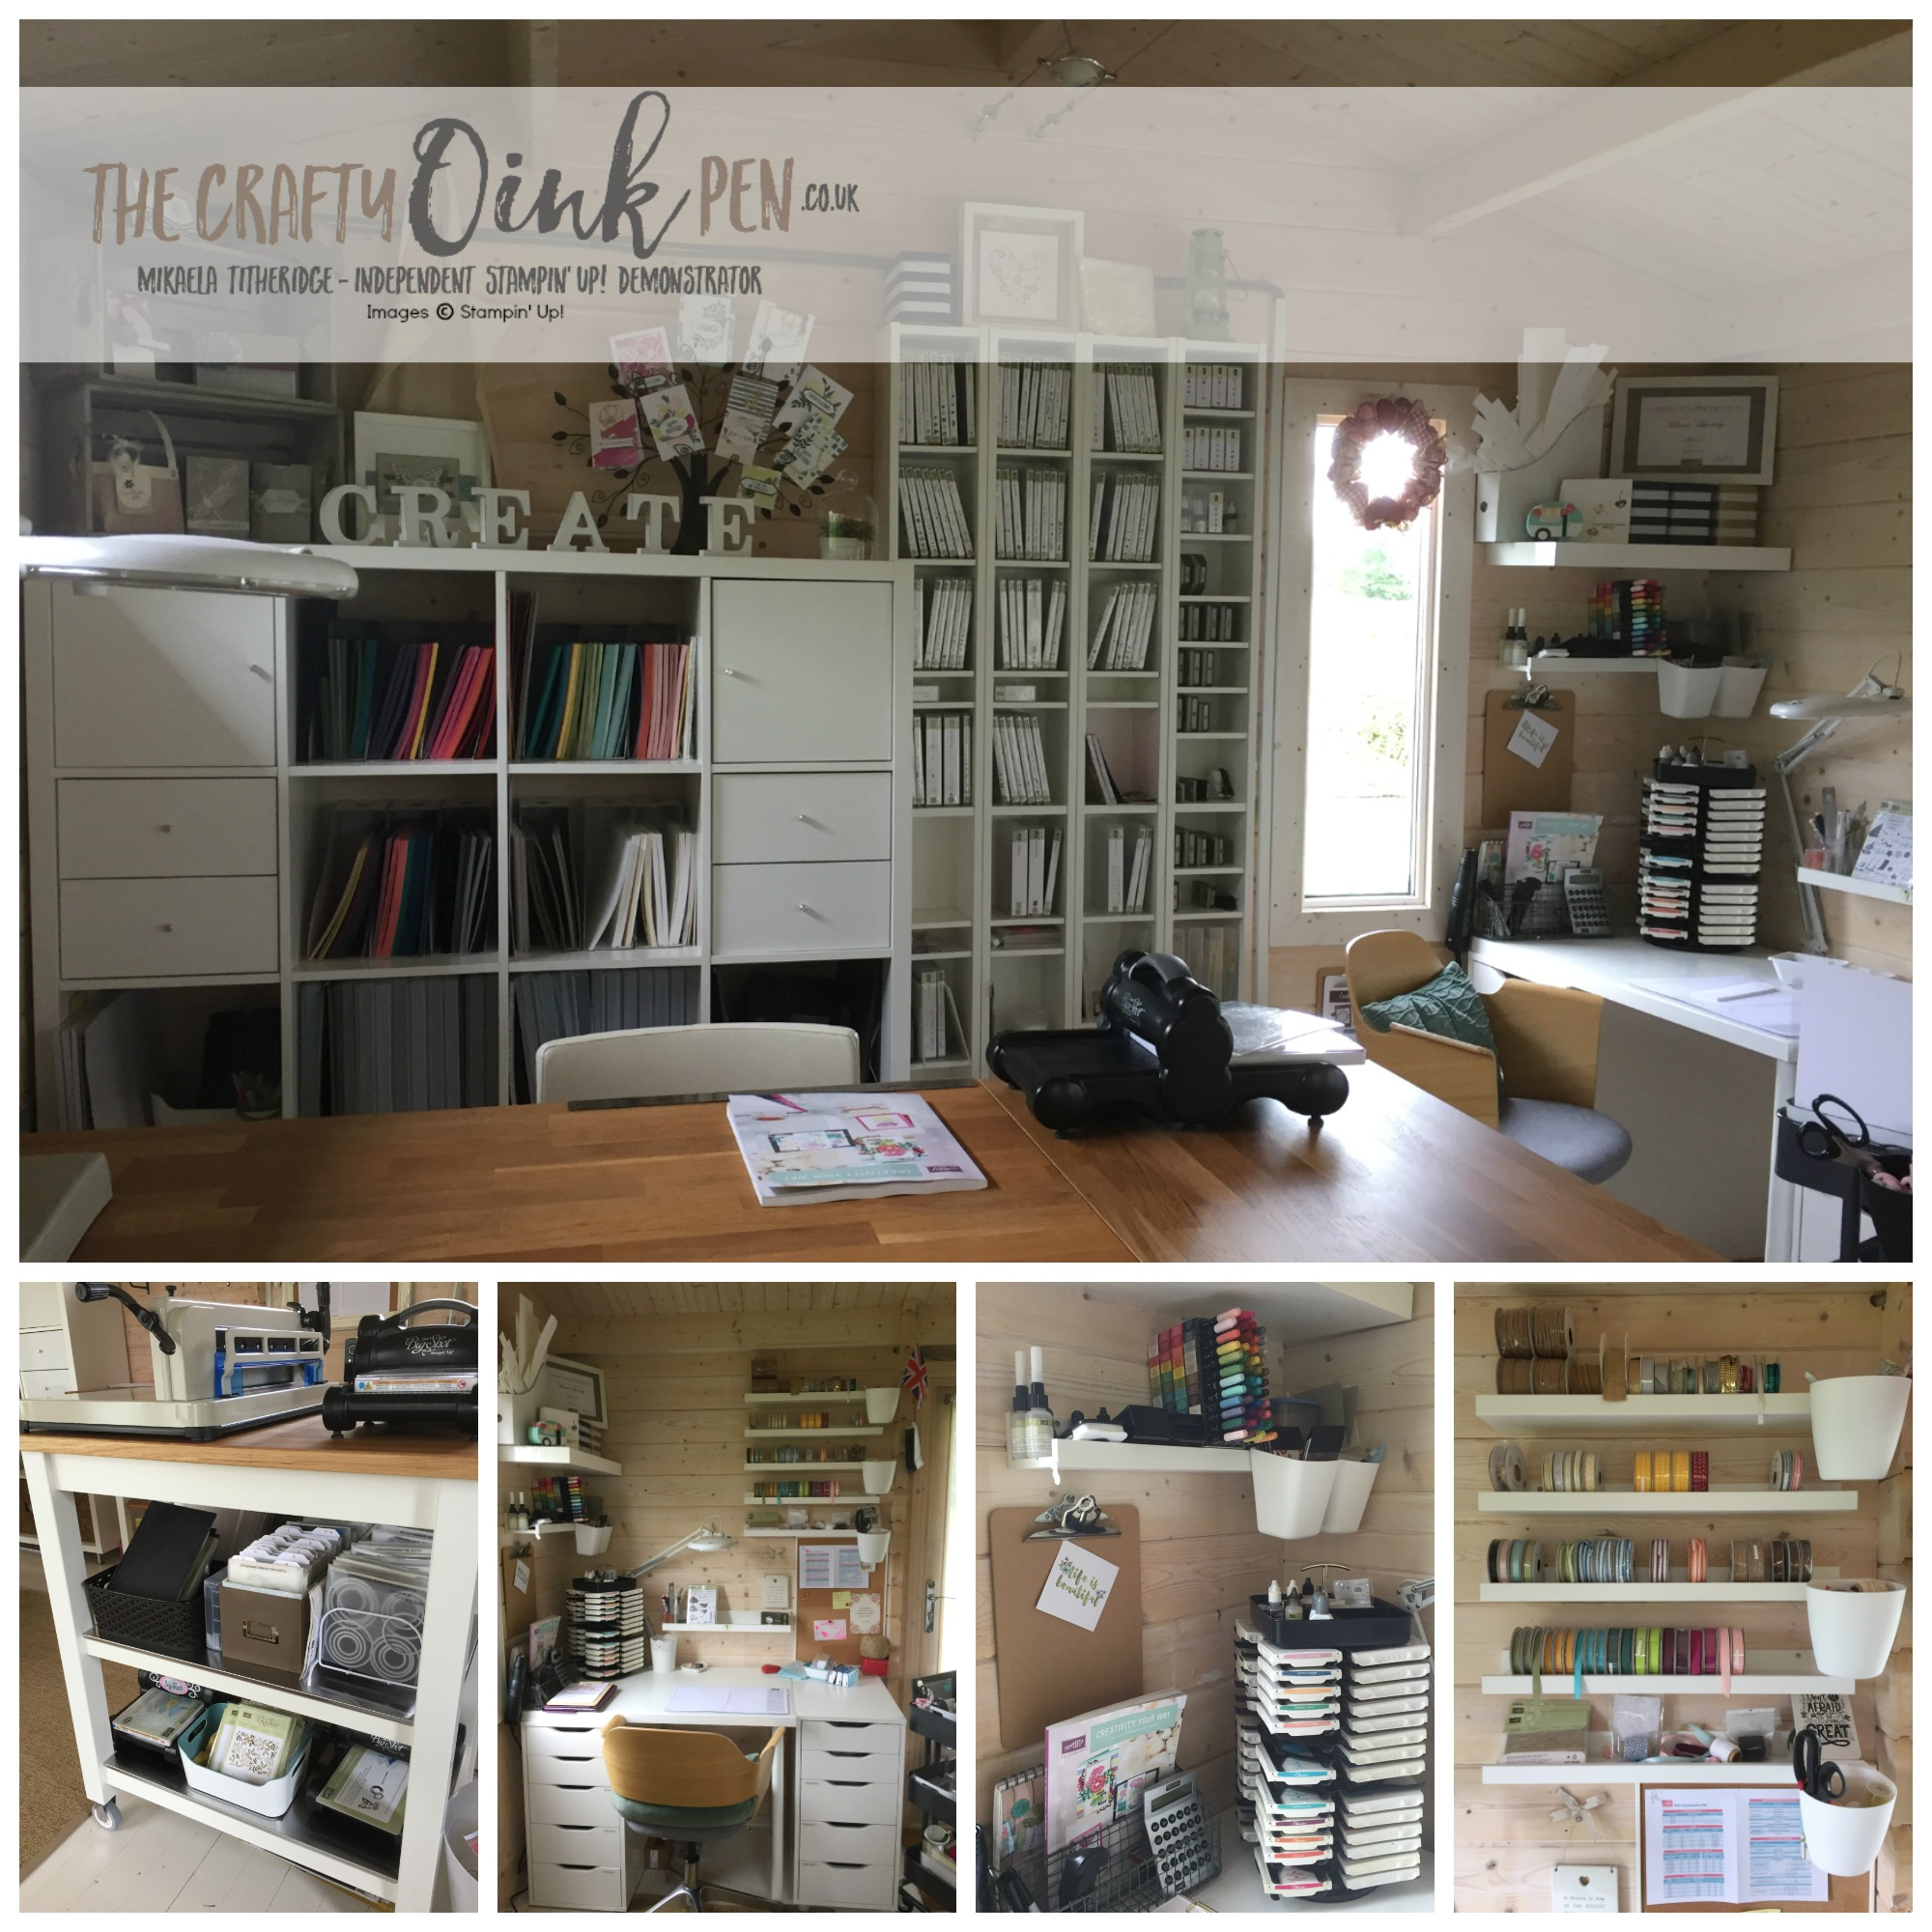 Craft Room Makeover: Craft Room Makeover At The Crafty OINK Pen